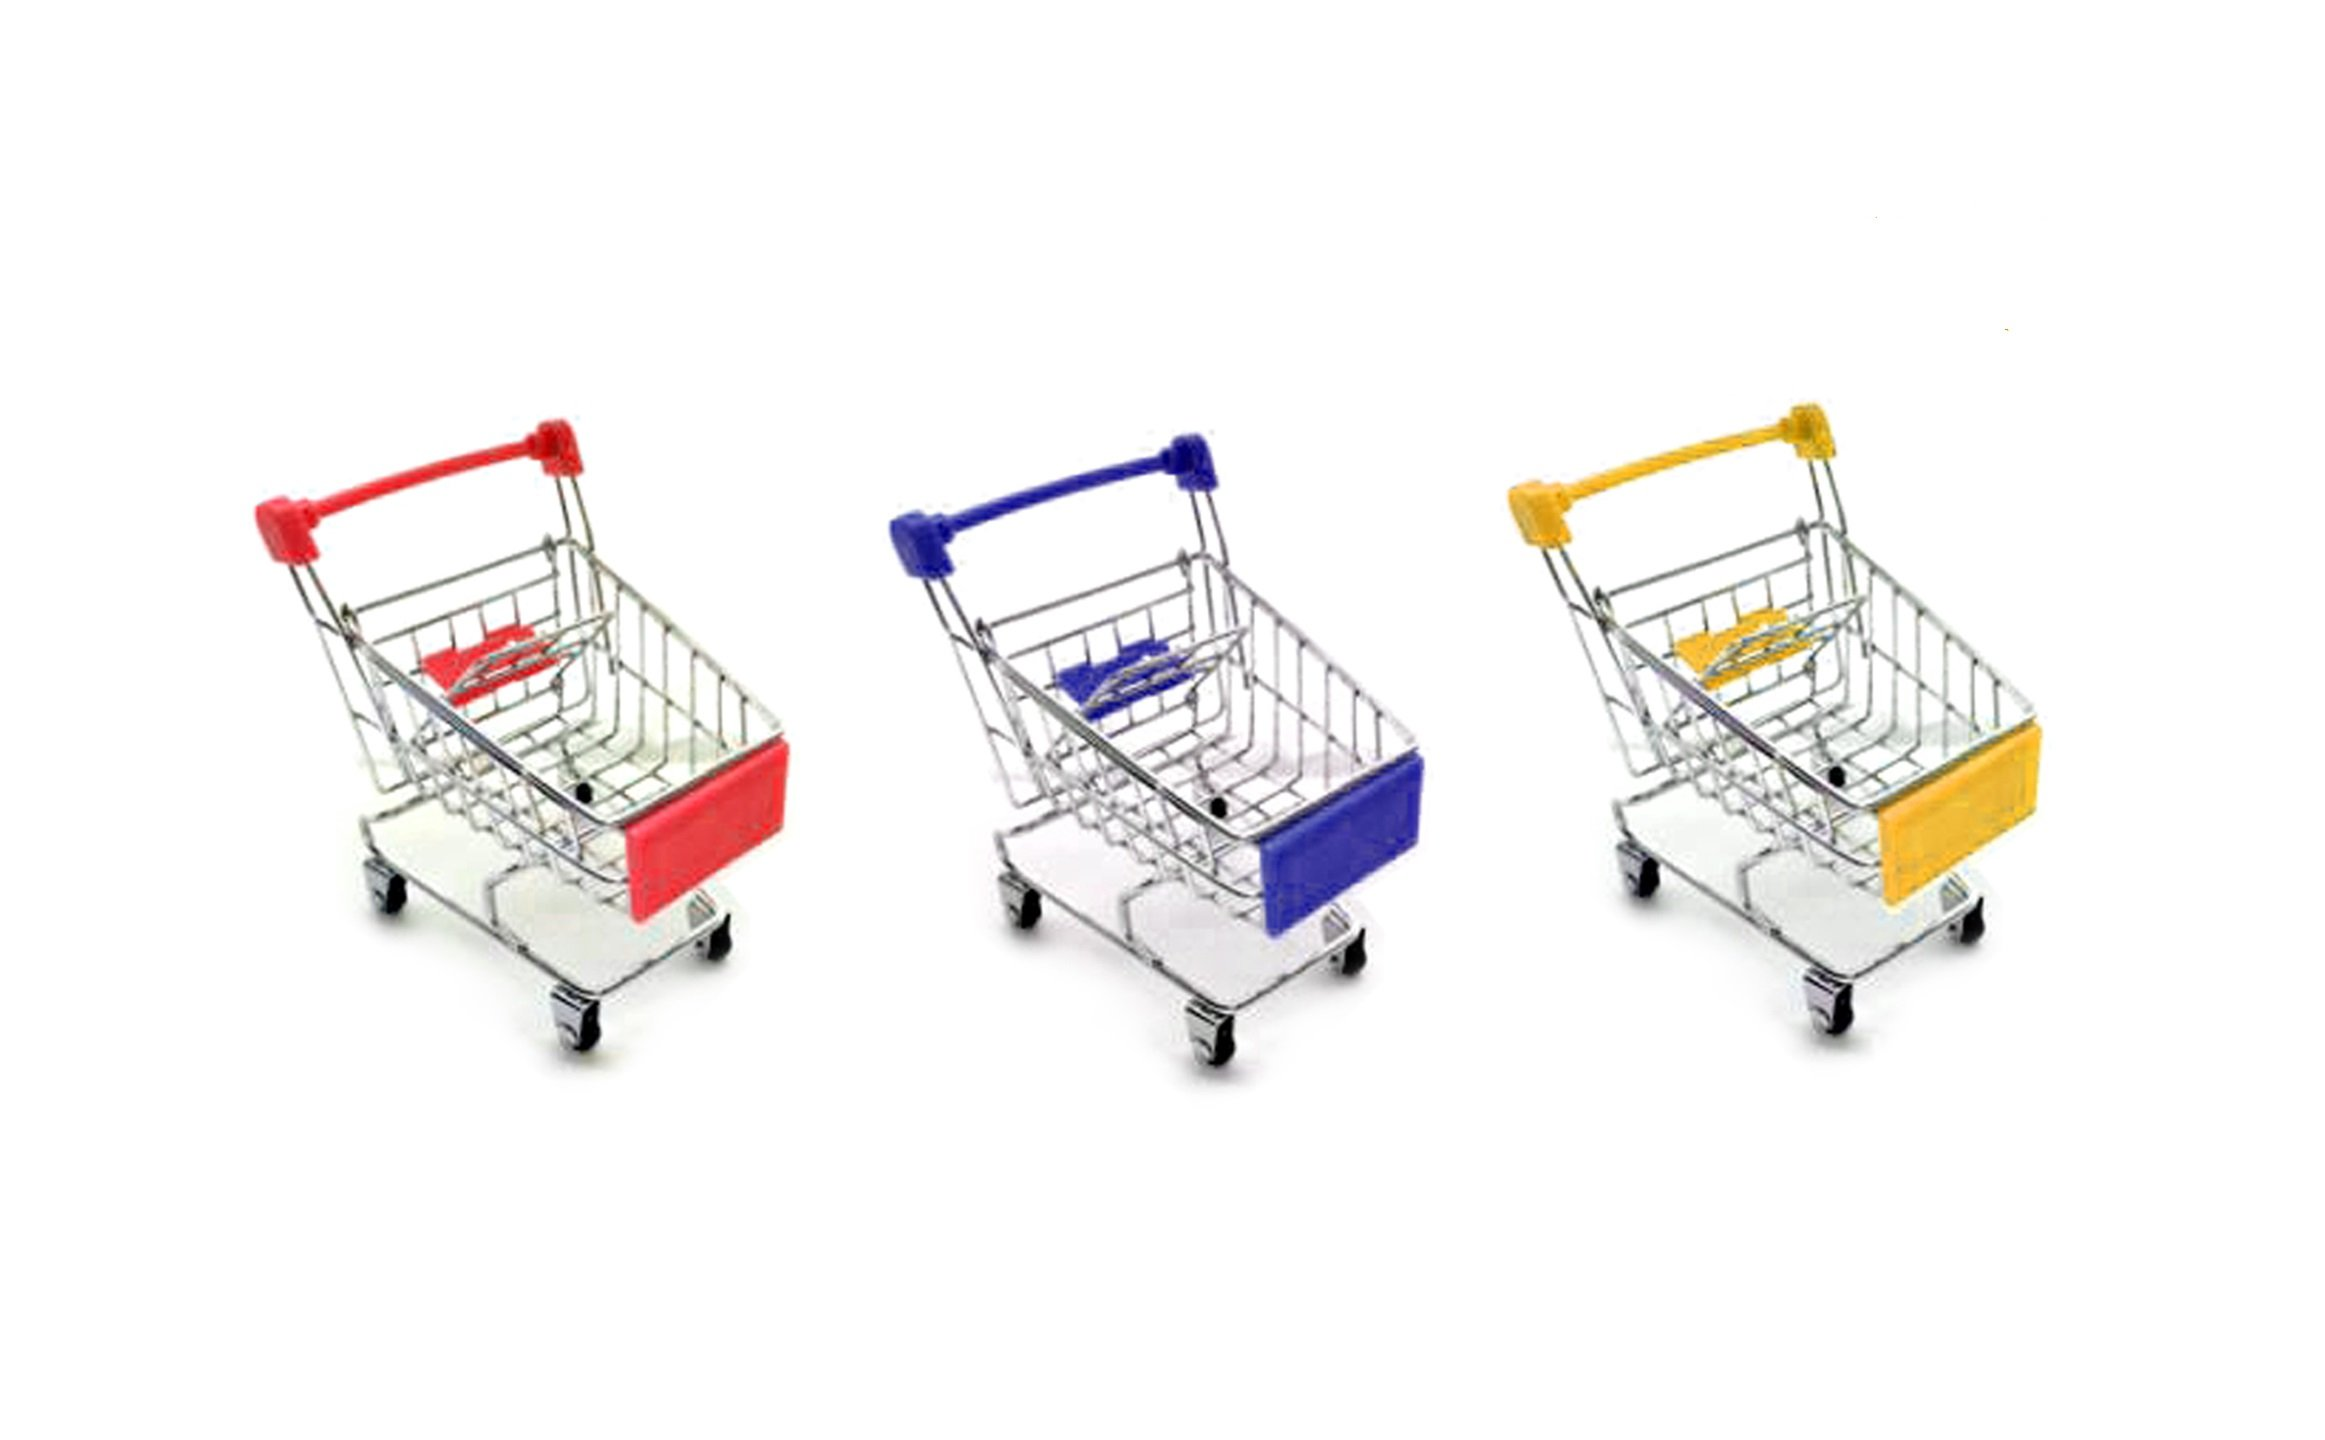 Bestsupplier Mini Supermarket Handcart, 3 Pcs Mini Shopping Cart Supermarket Handcart Shopping Utility Cart Mode Storage Toy